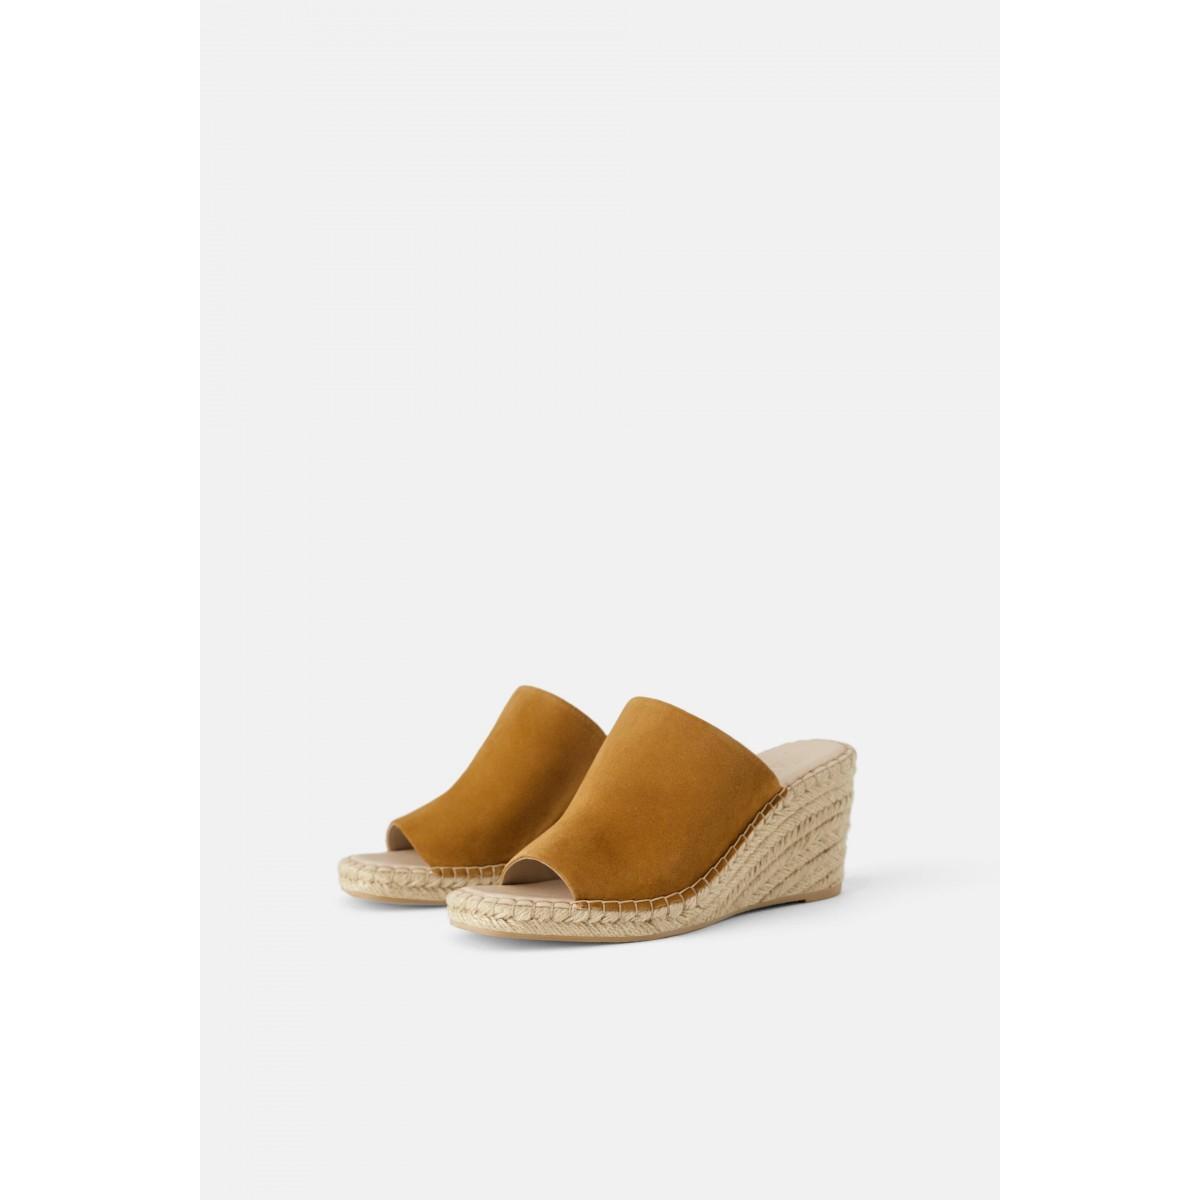 Zara Leather Wedges